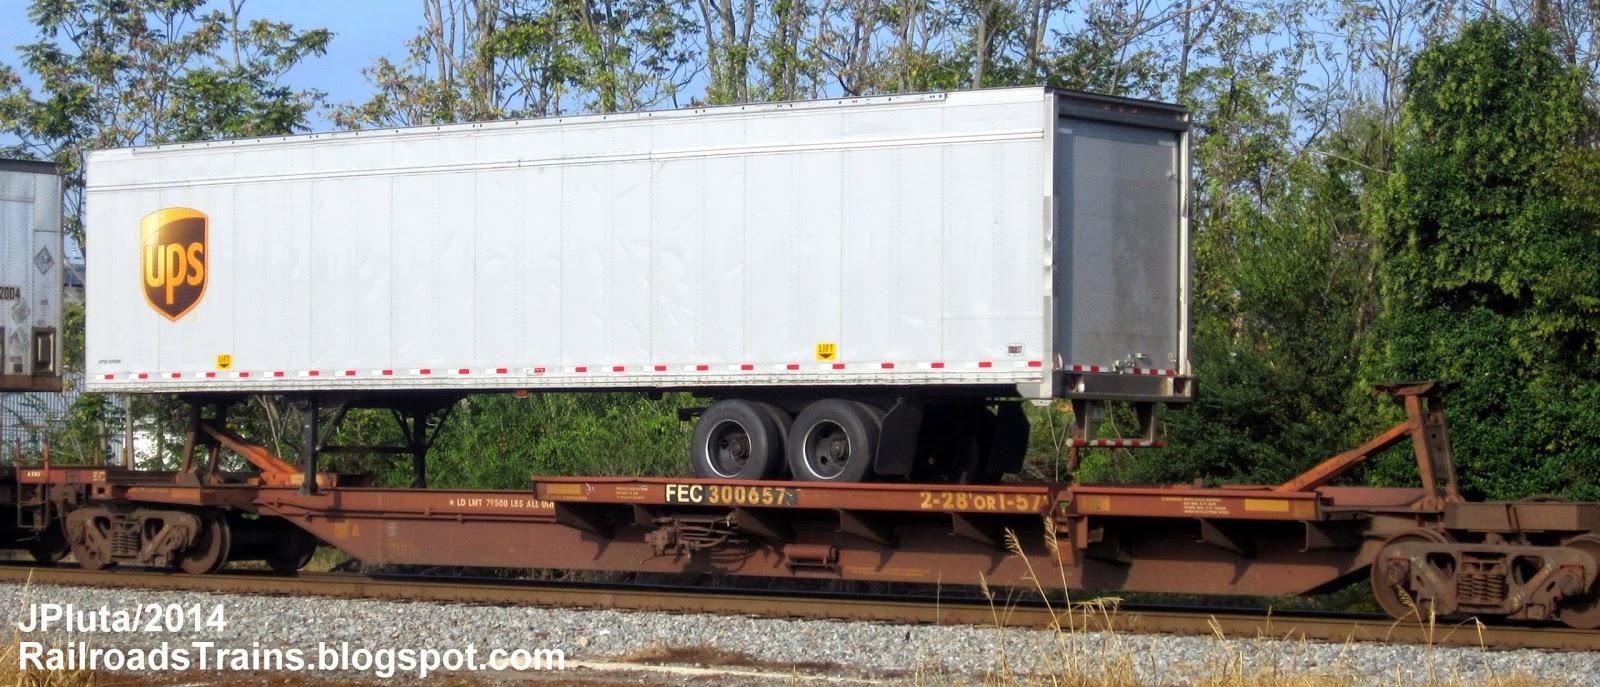 FEC 300657 Flatbed Rail Car Piggy Back UPS Truck Trailer United.